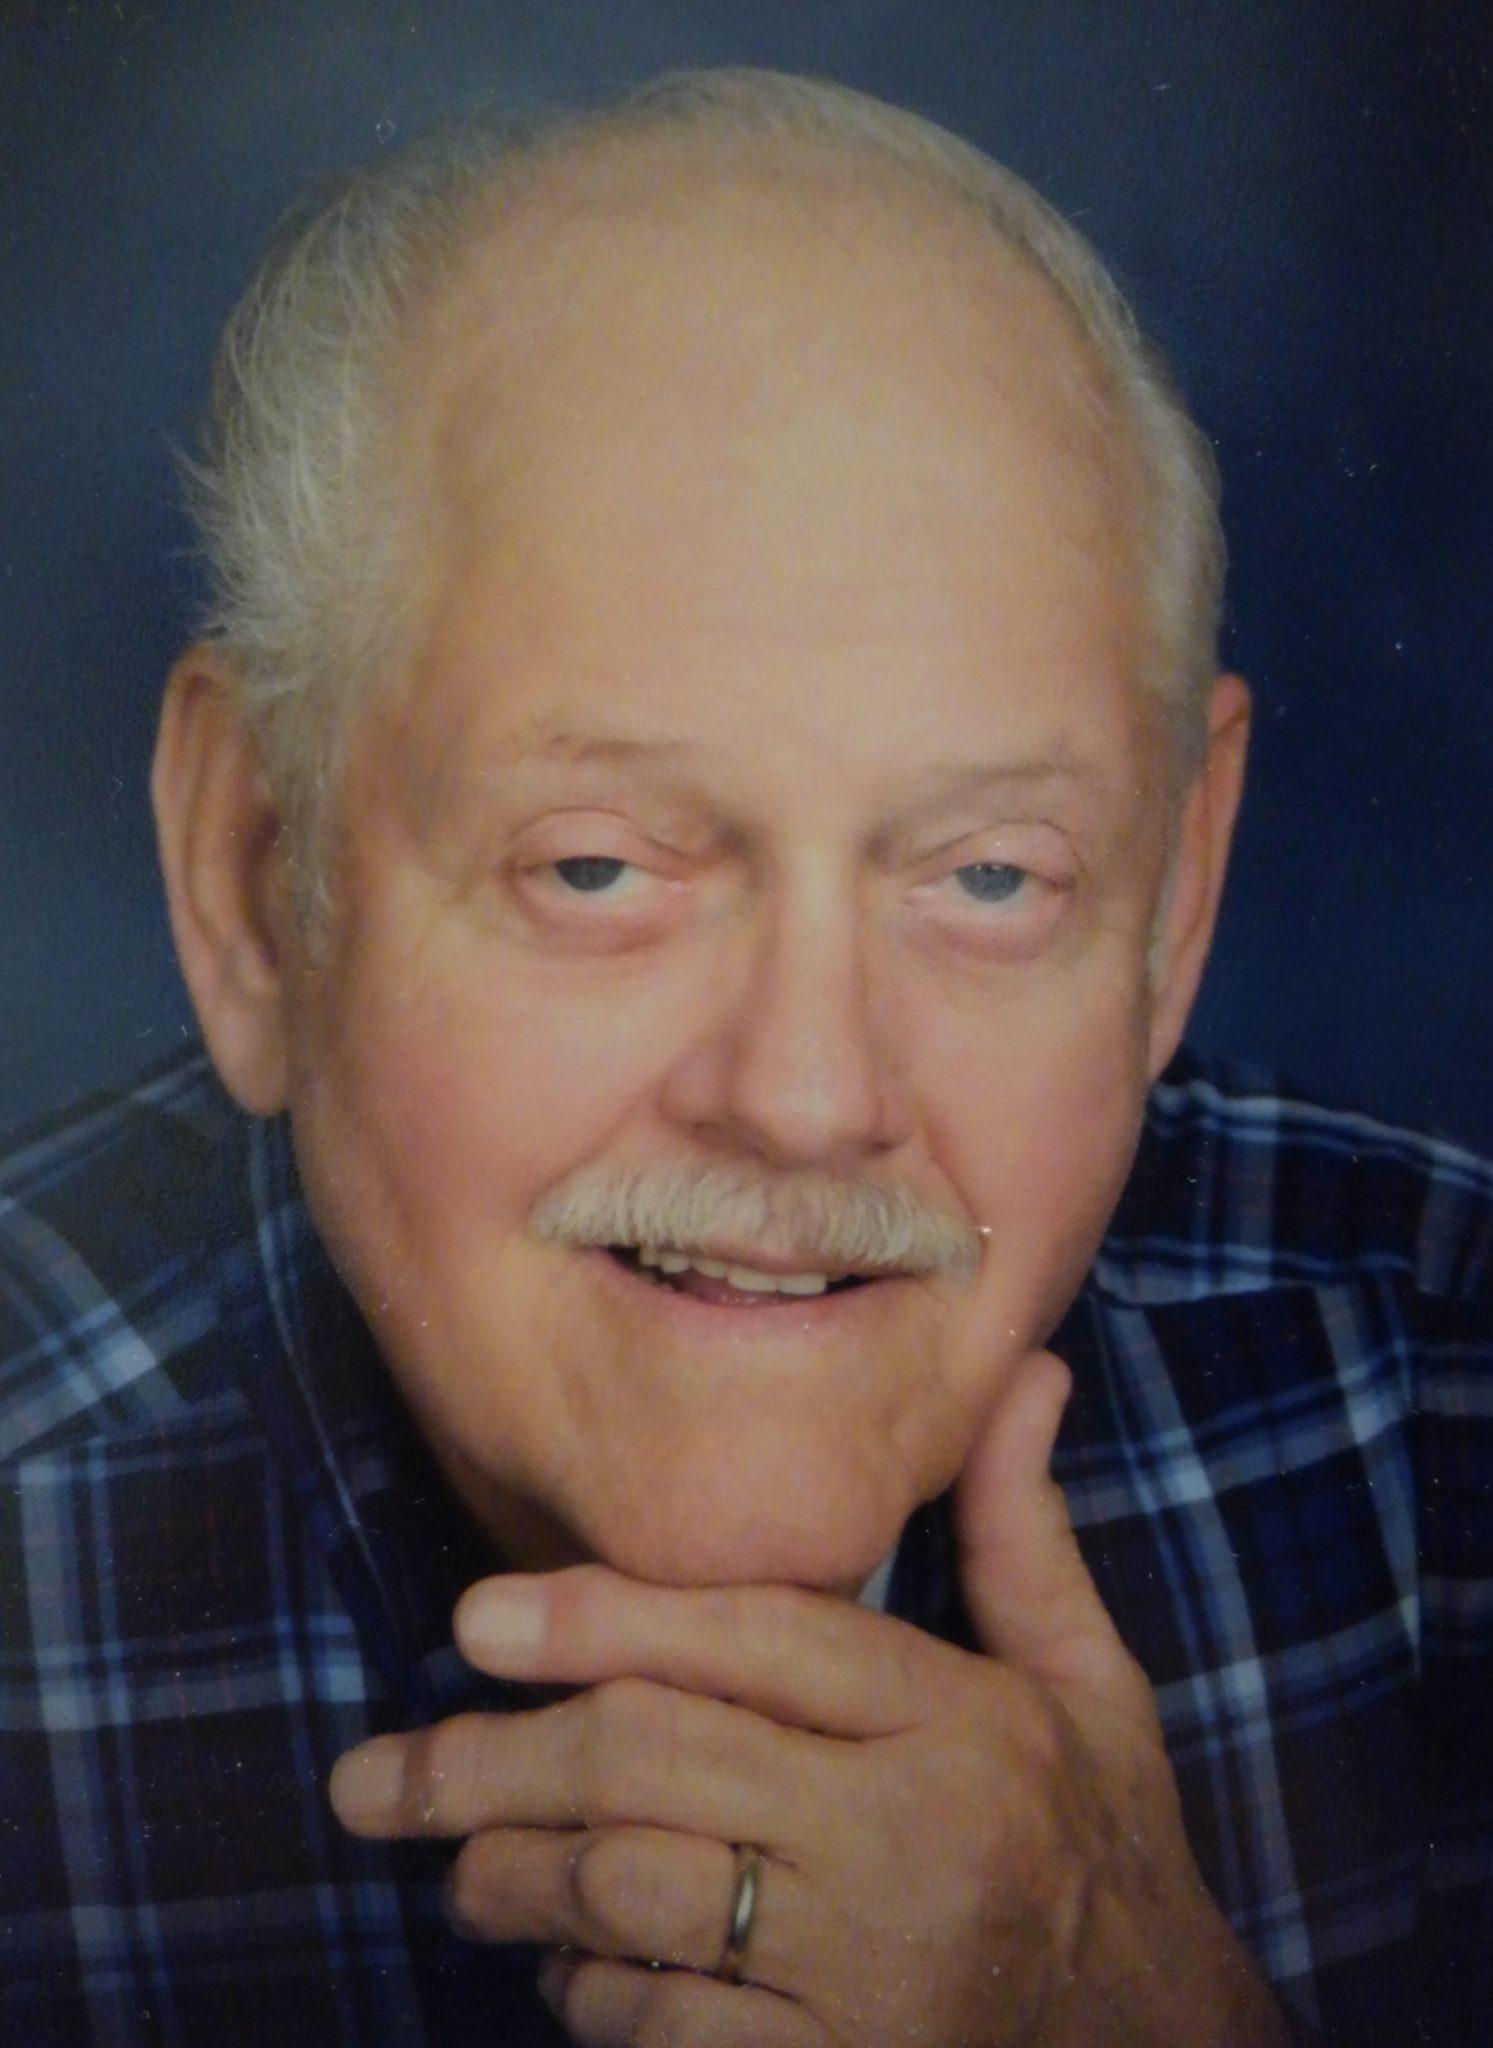 Kenneth Bullock obit1 1 - Kenneth L. Bullock